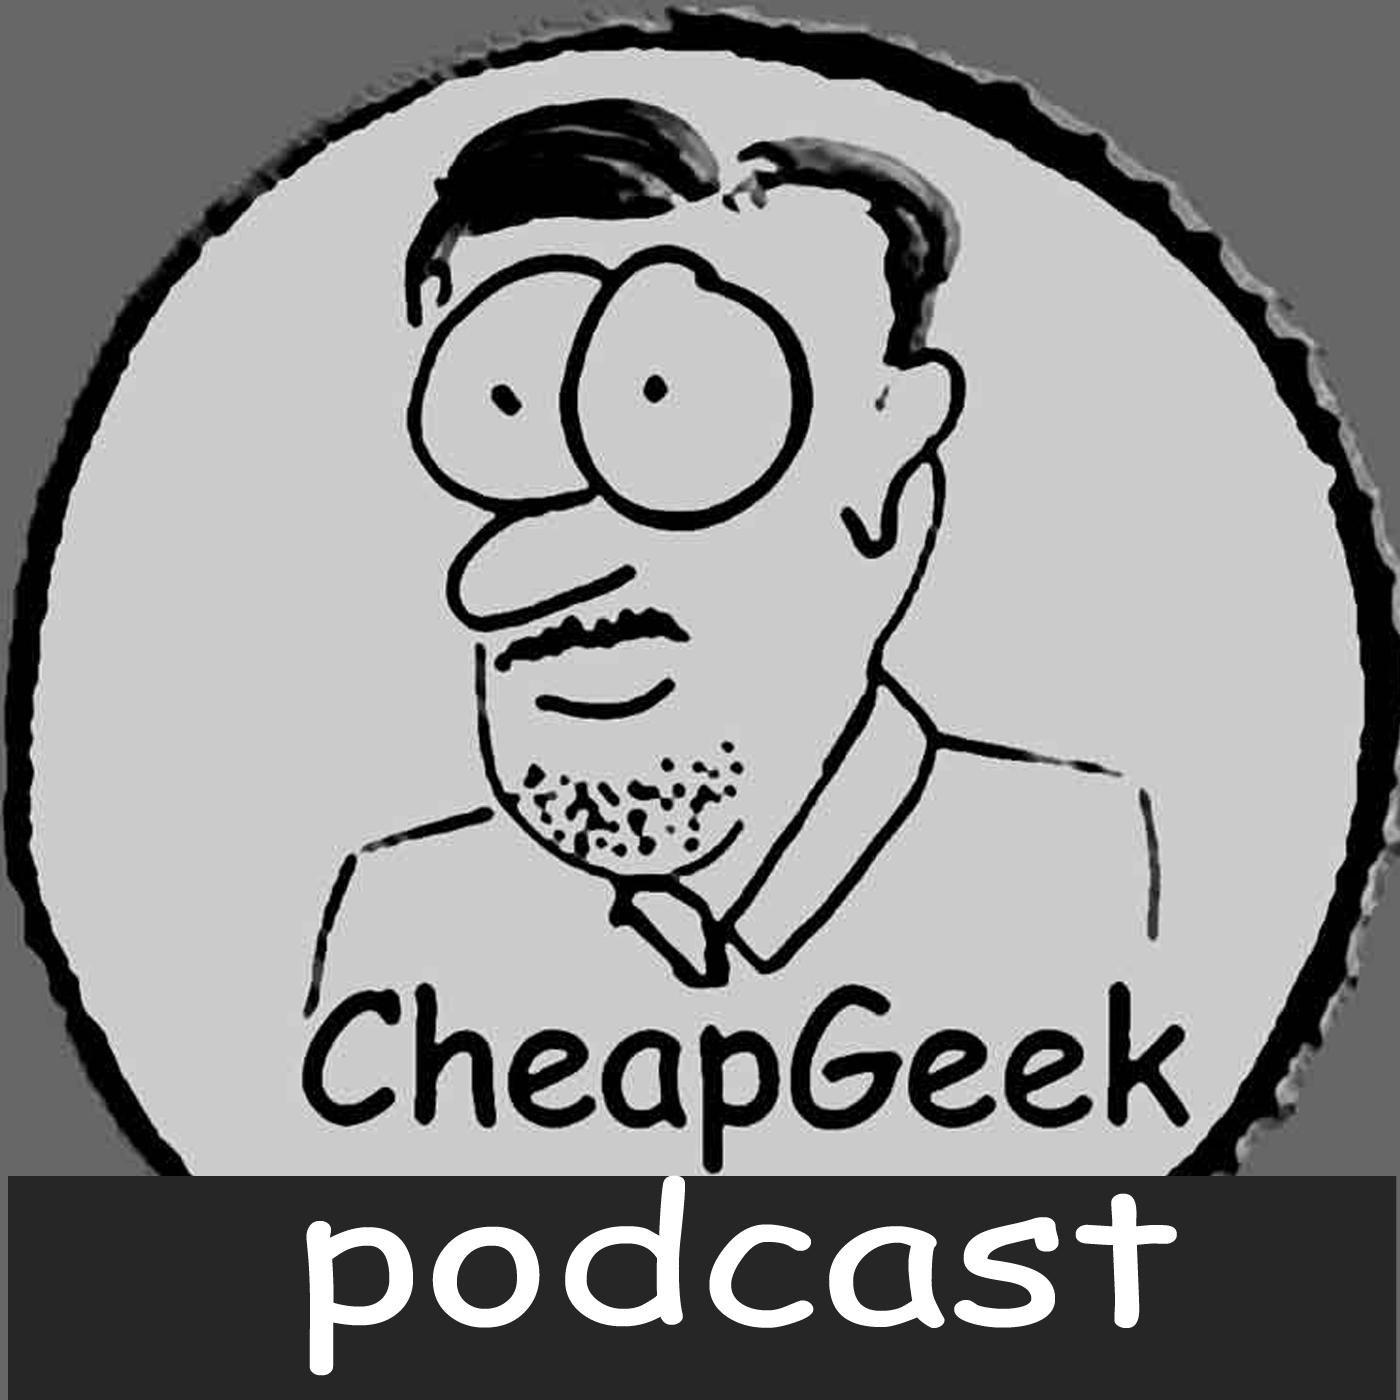 CheapGeek Podcast logo